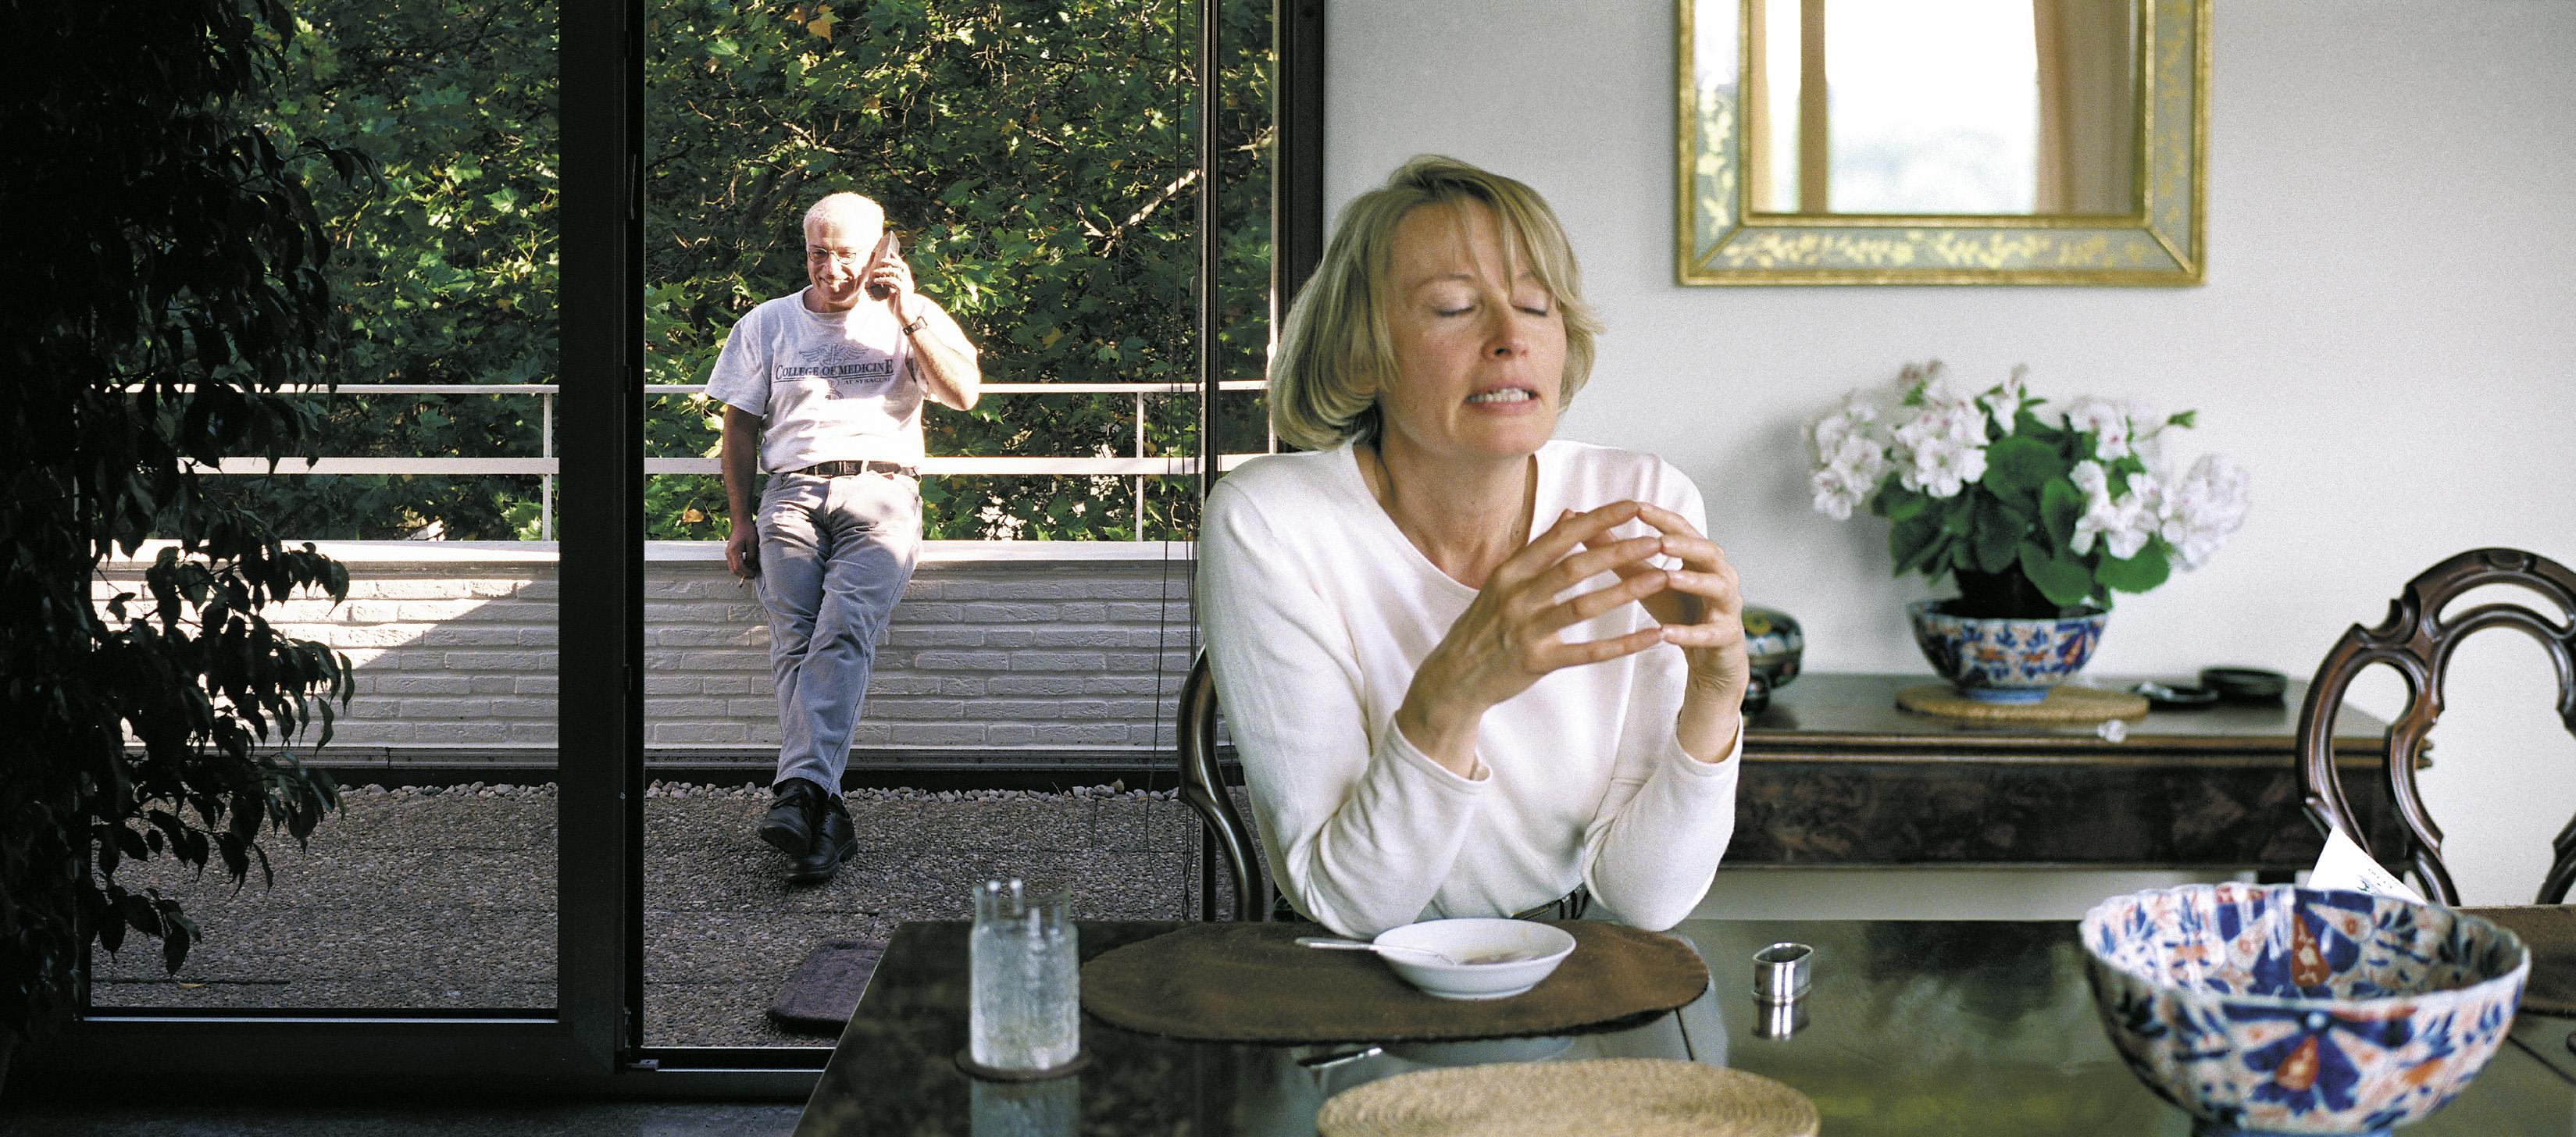 Christopher Muller, Lunch, 2000, C-Print hinter Acrylglas, 52x118, (Foto: C. Muller)